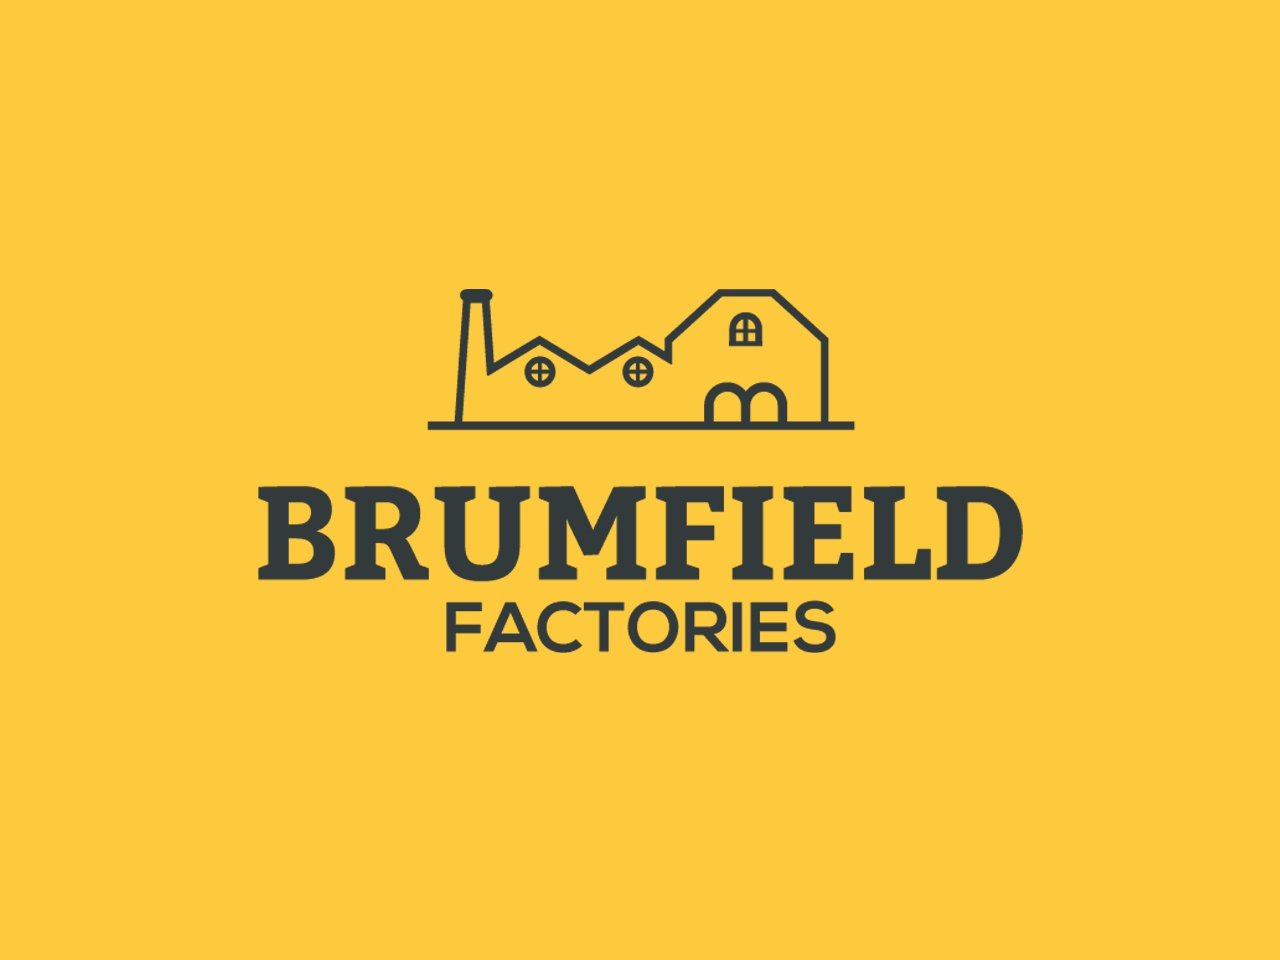 Brumfield Factories manufacture factory flat web app vector design simple icon ui illustration brand badge branding handcrafted logo vintage retro